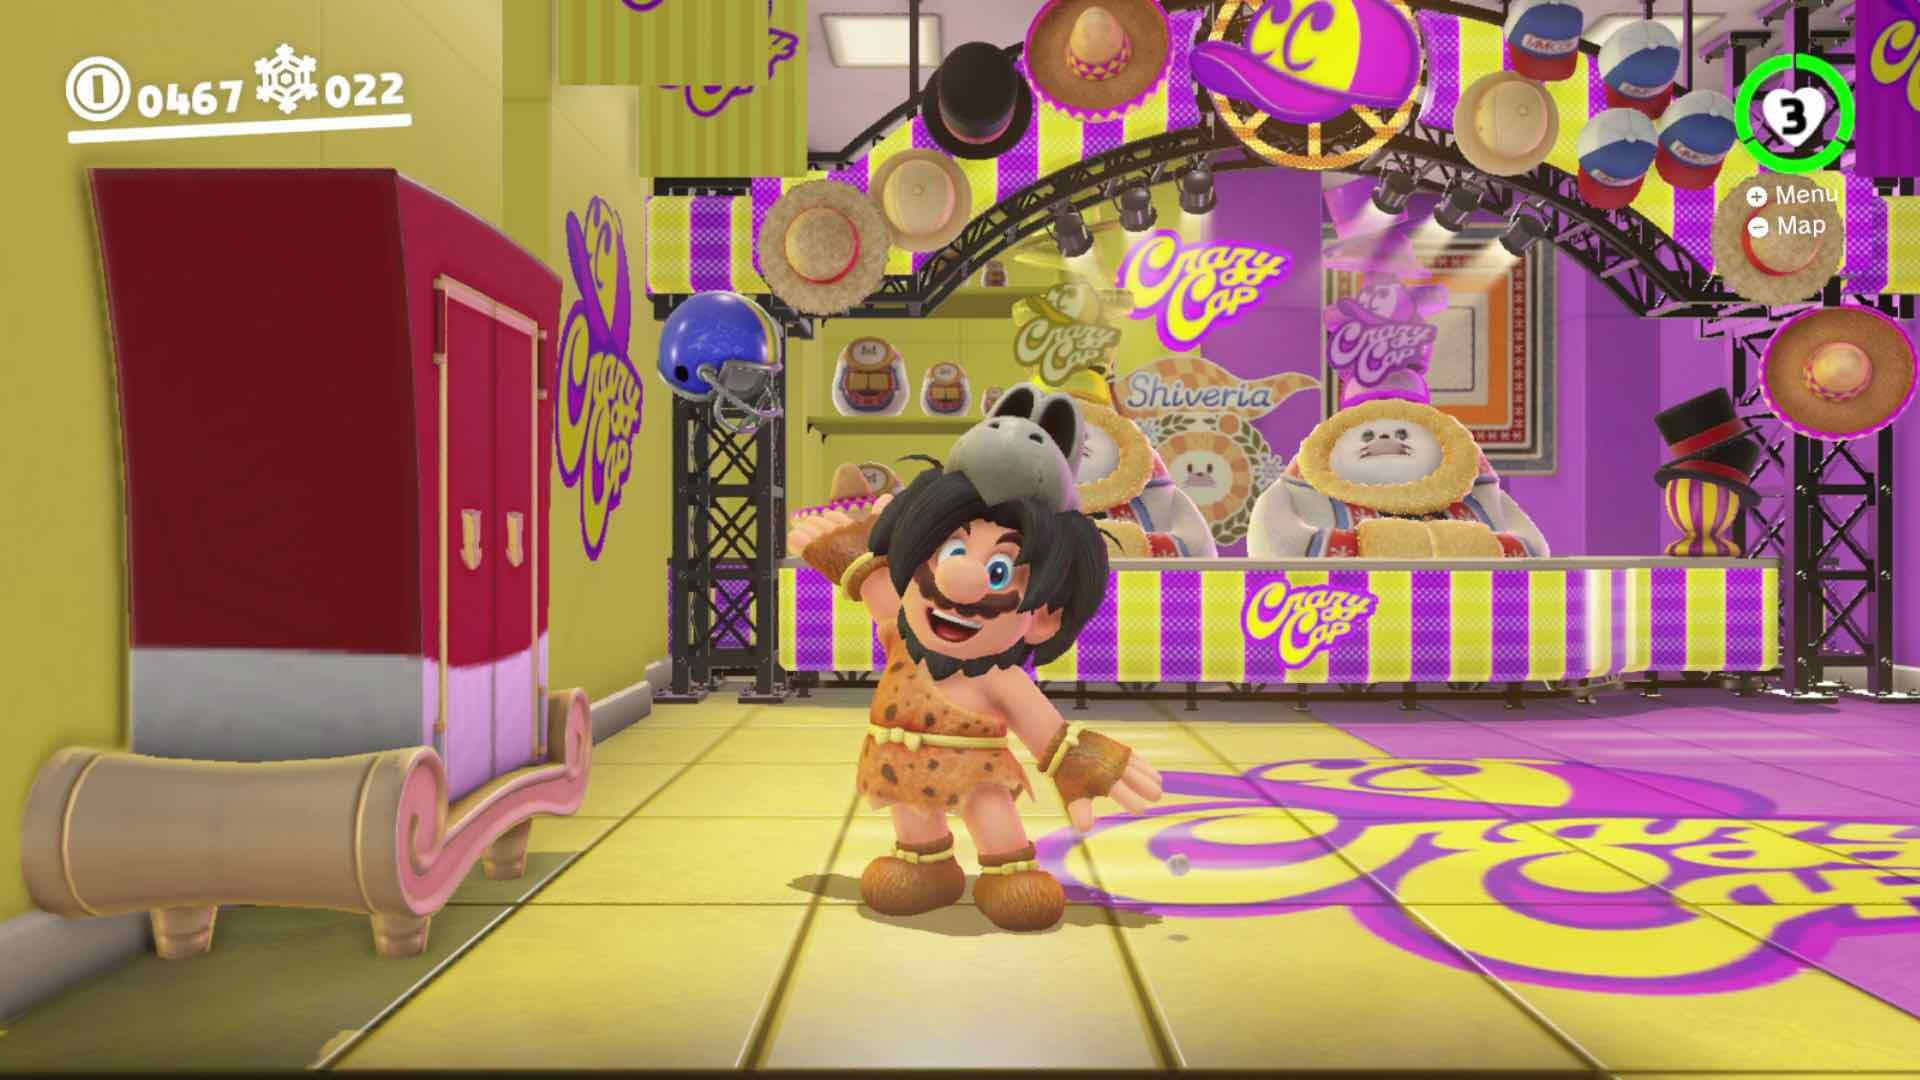 caveman-outfit-super-mario-odyssey-screenshot